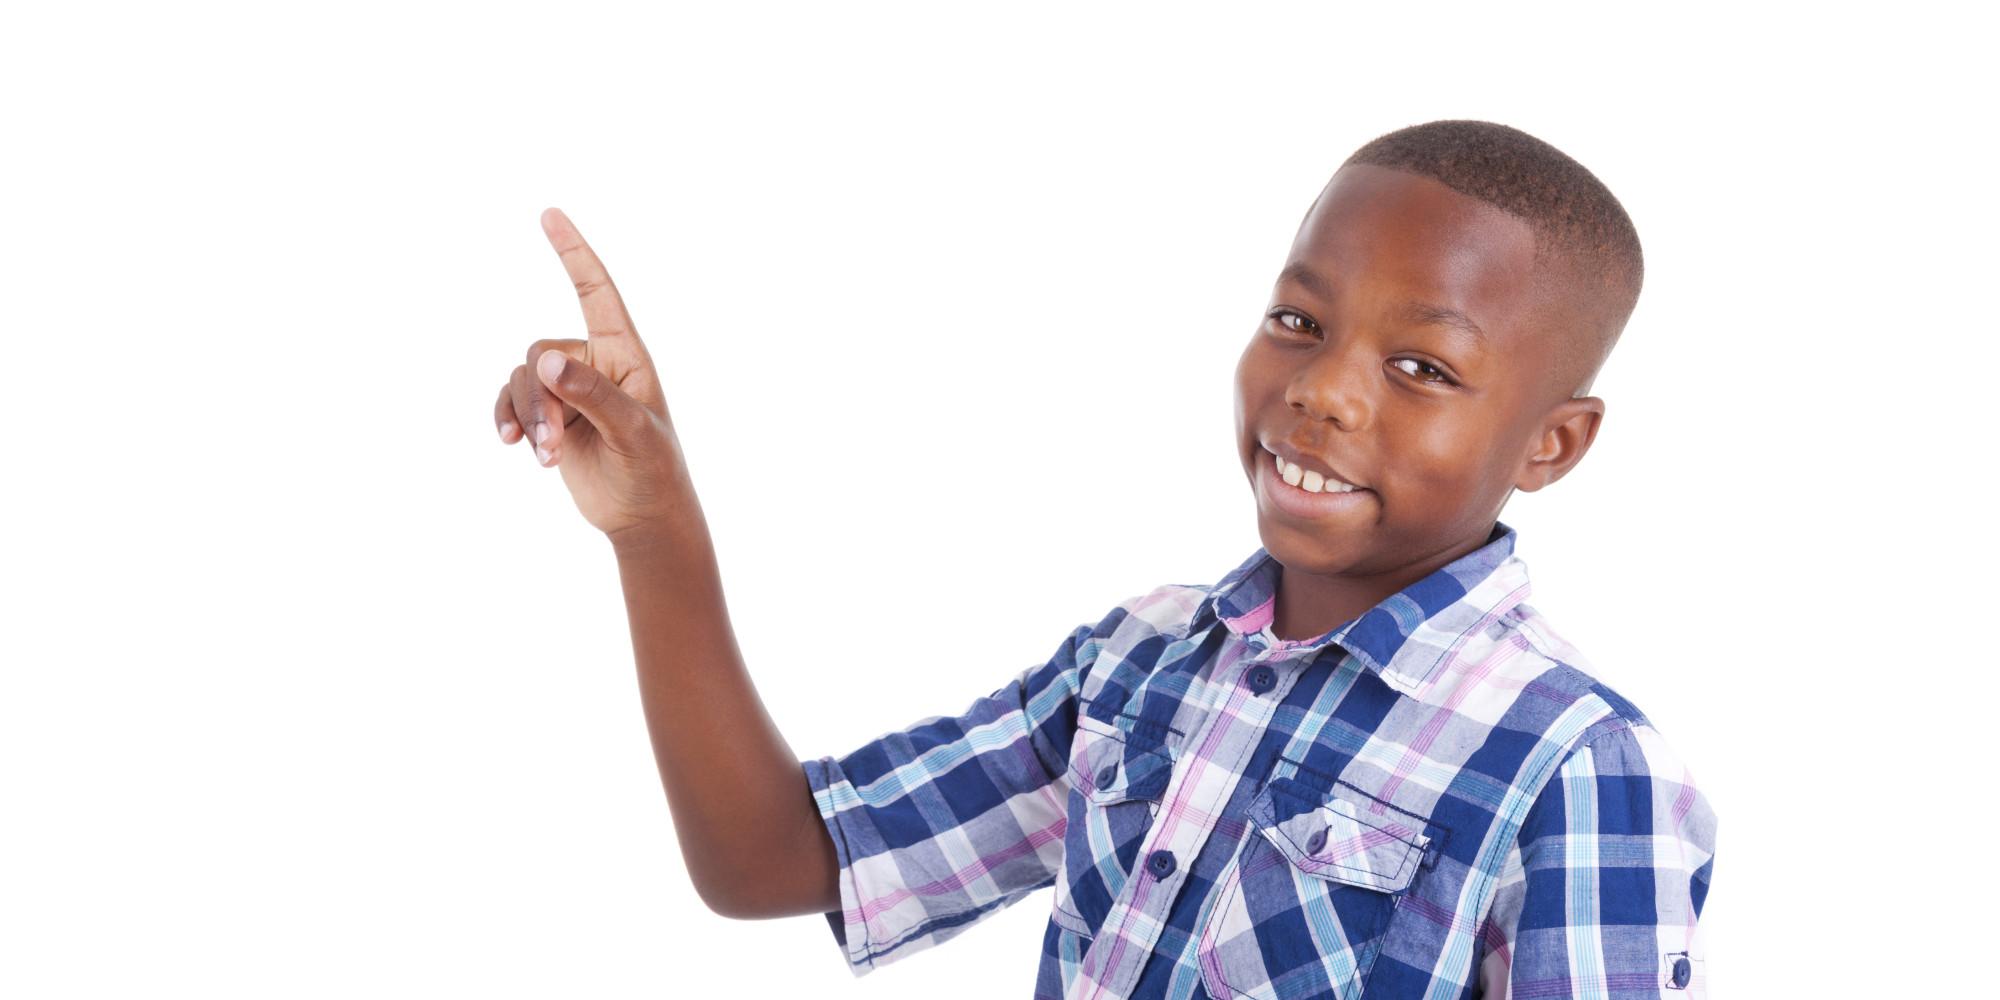 Black People Pointing Their Fingers Keep Getting Accused